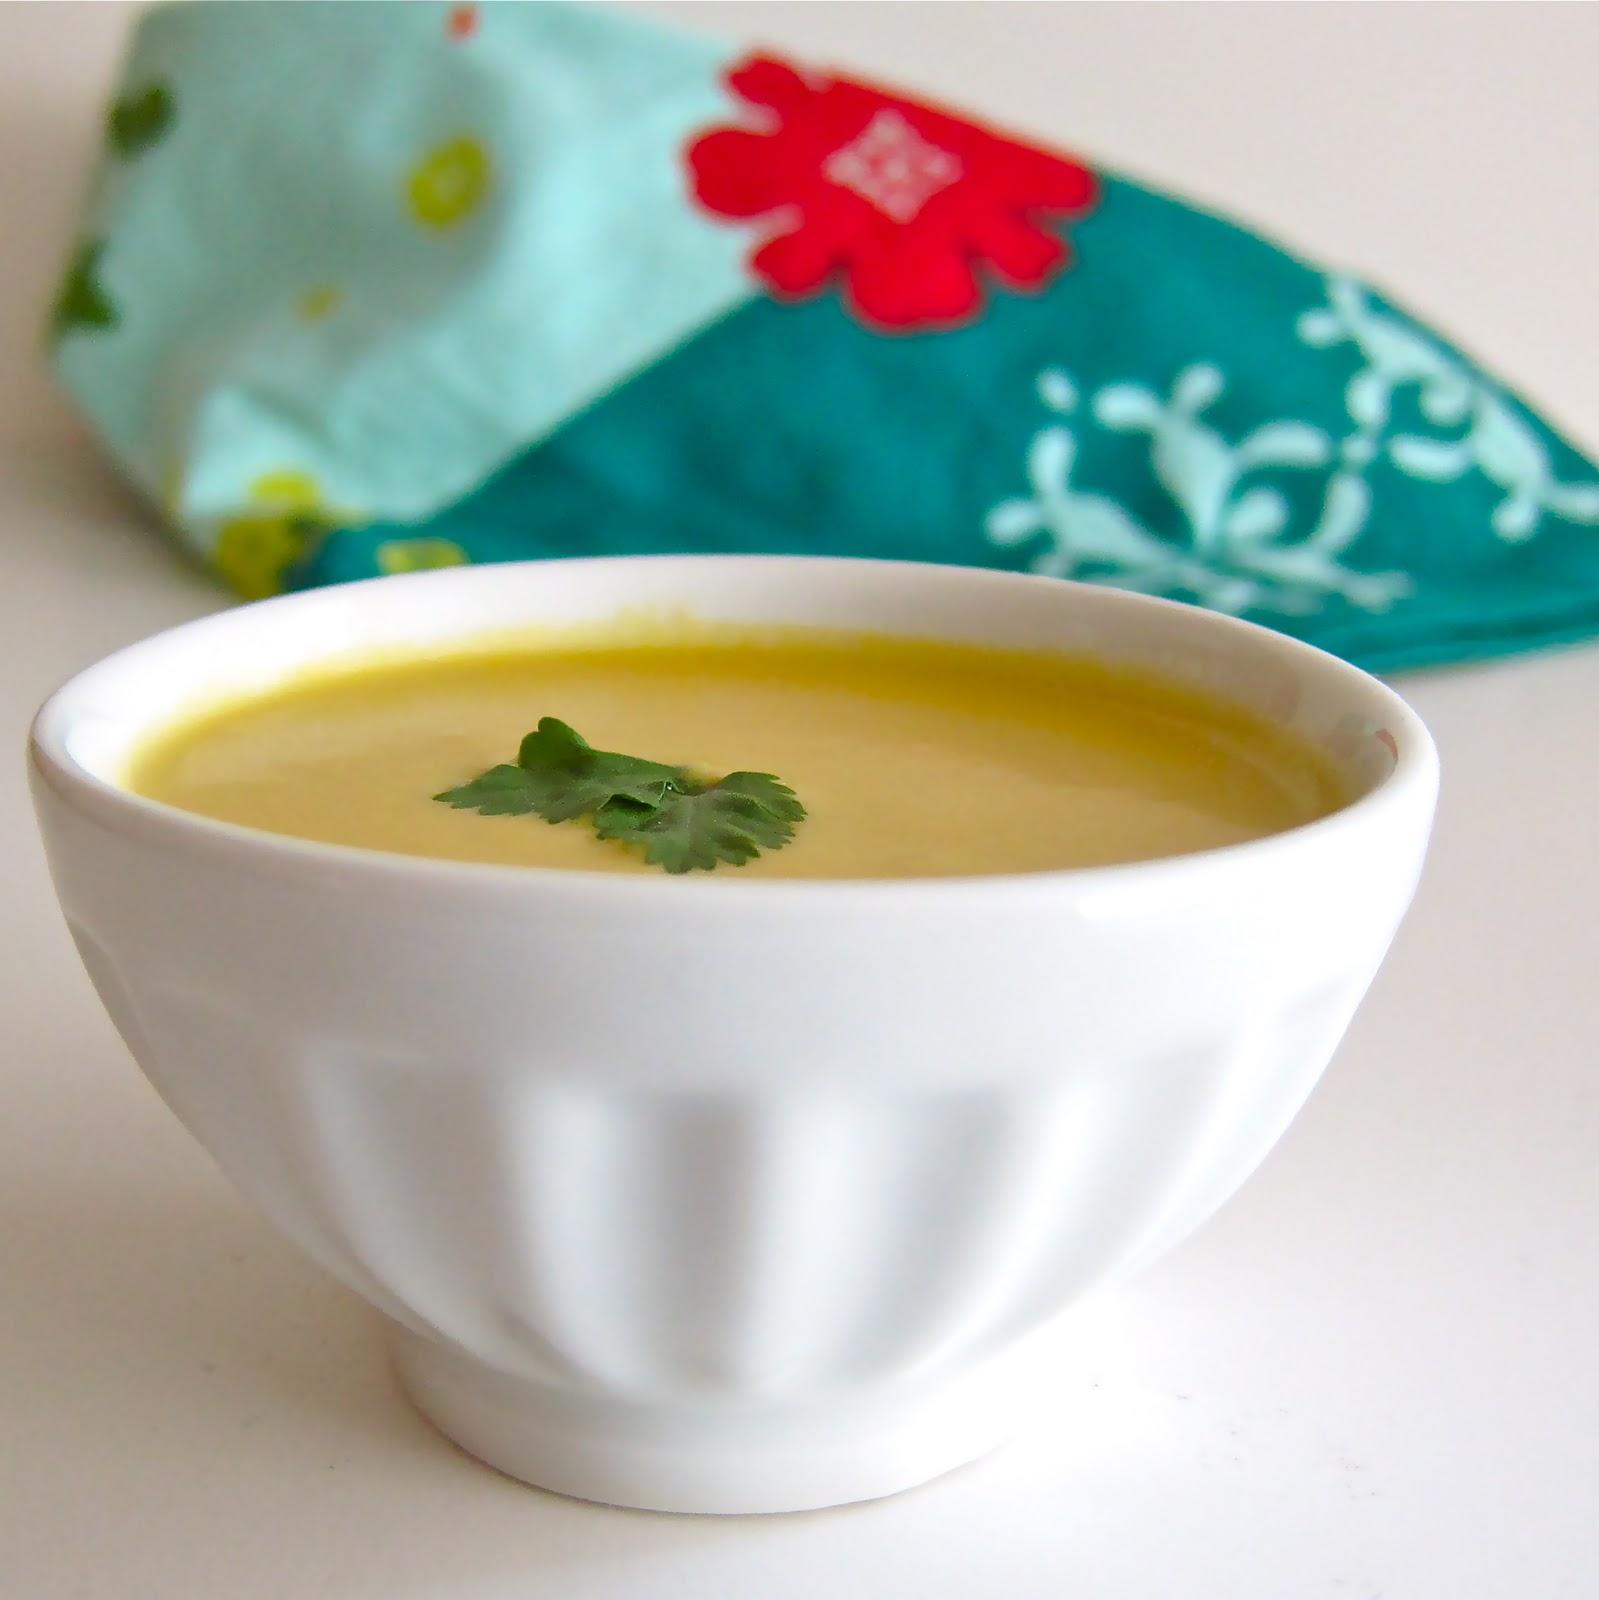 Fairbanks Soup Kitchen